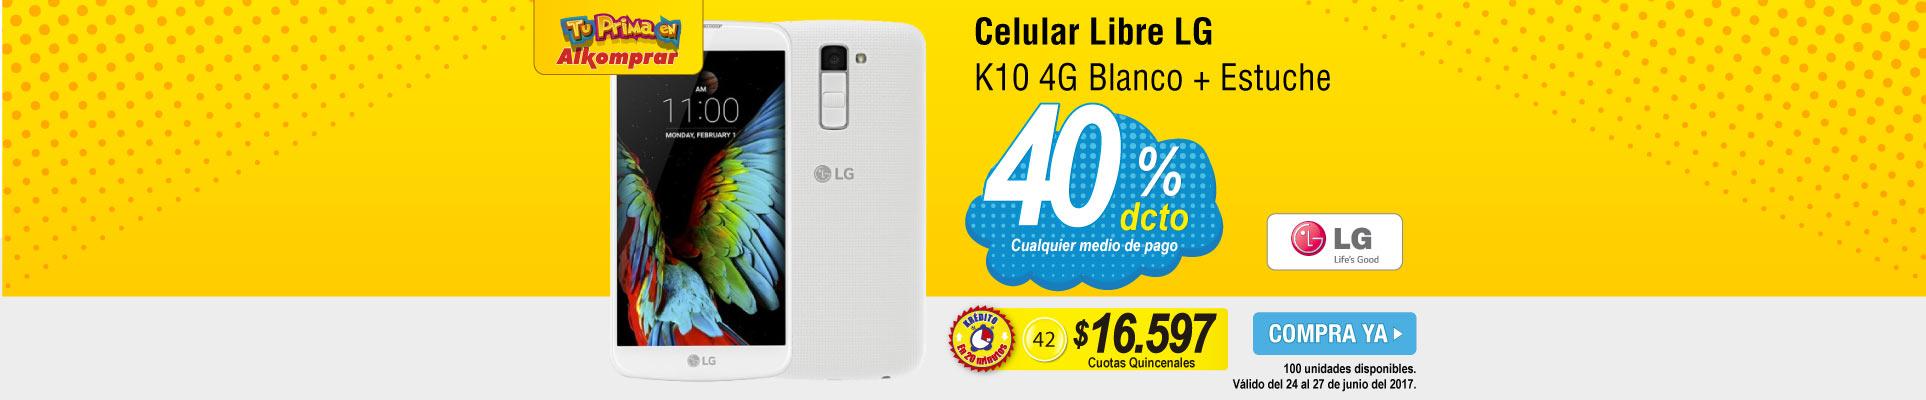 Celular LG K10 4G Blanco + Estuche - banner principal